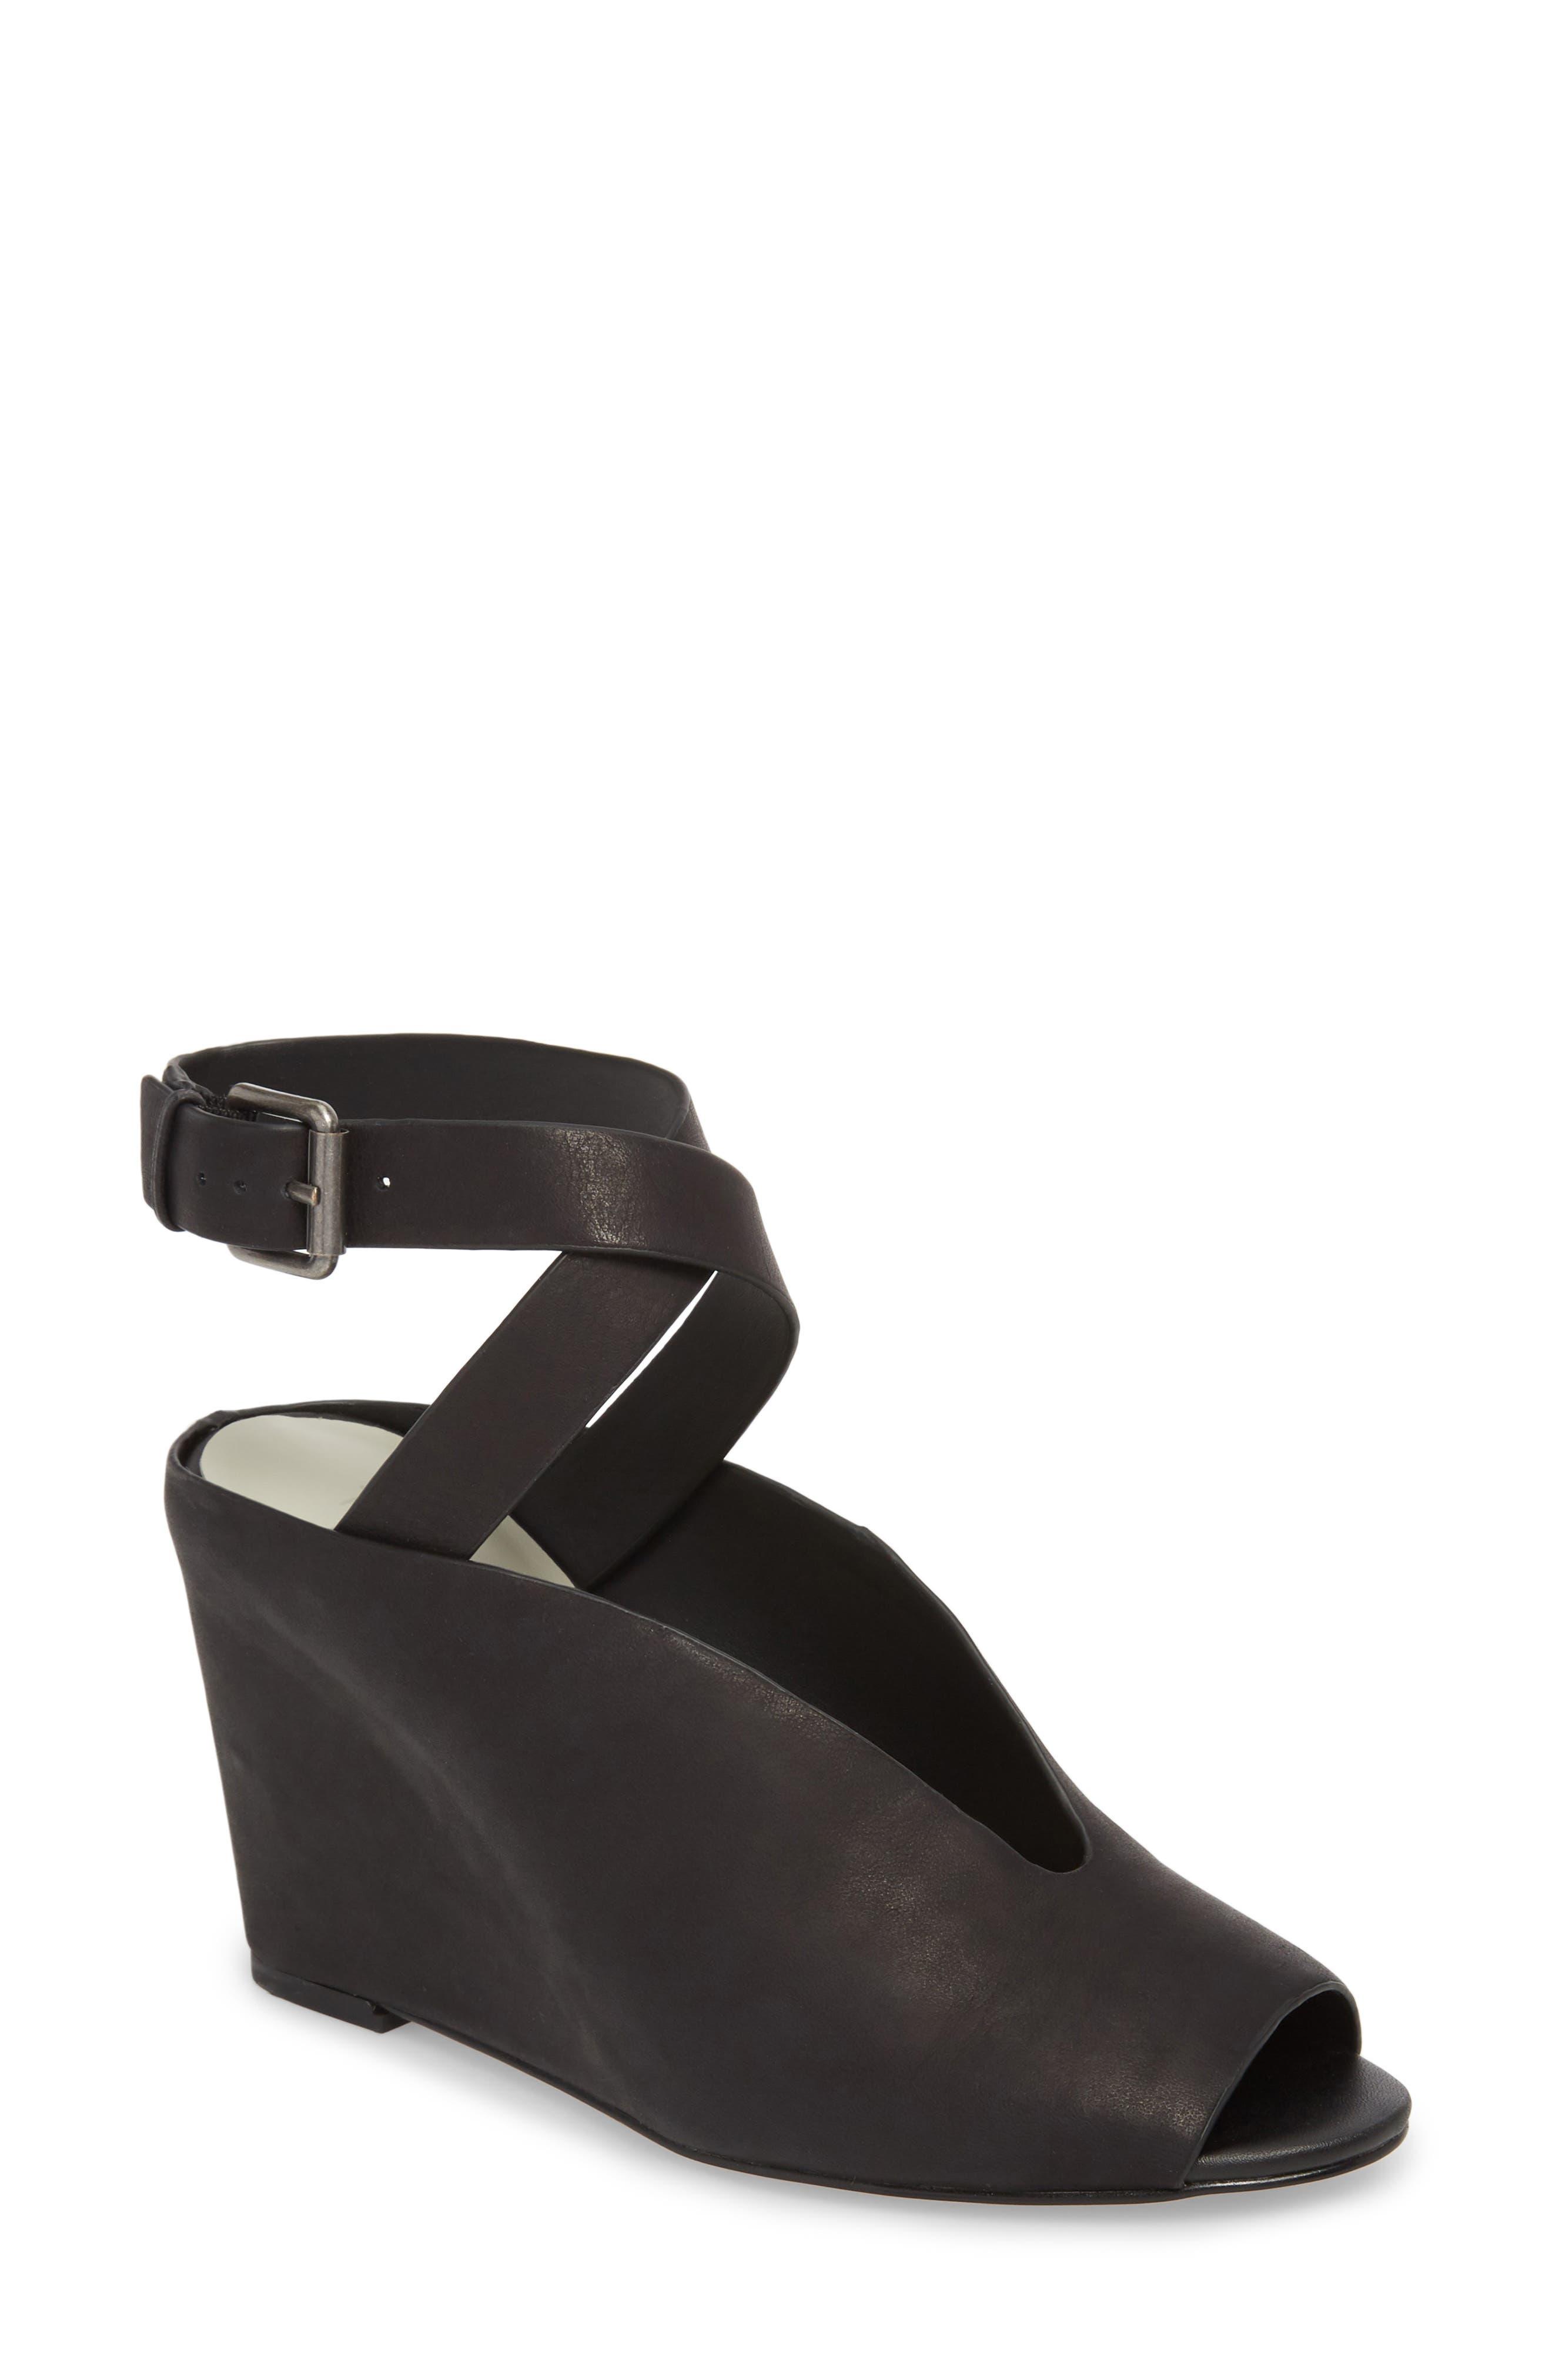 Felidia Wedge Sandal,                         Main,                         color, 001